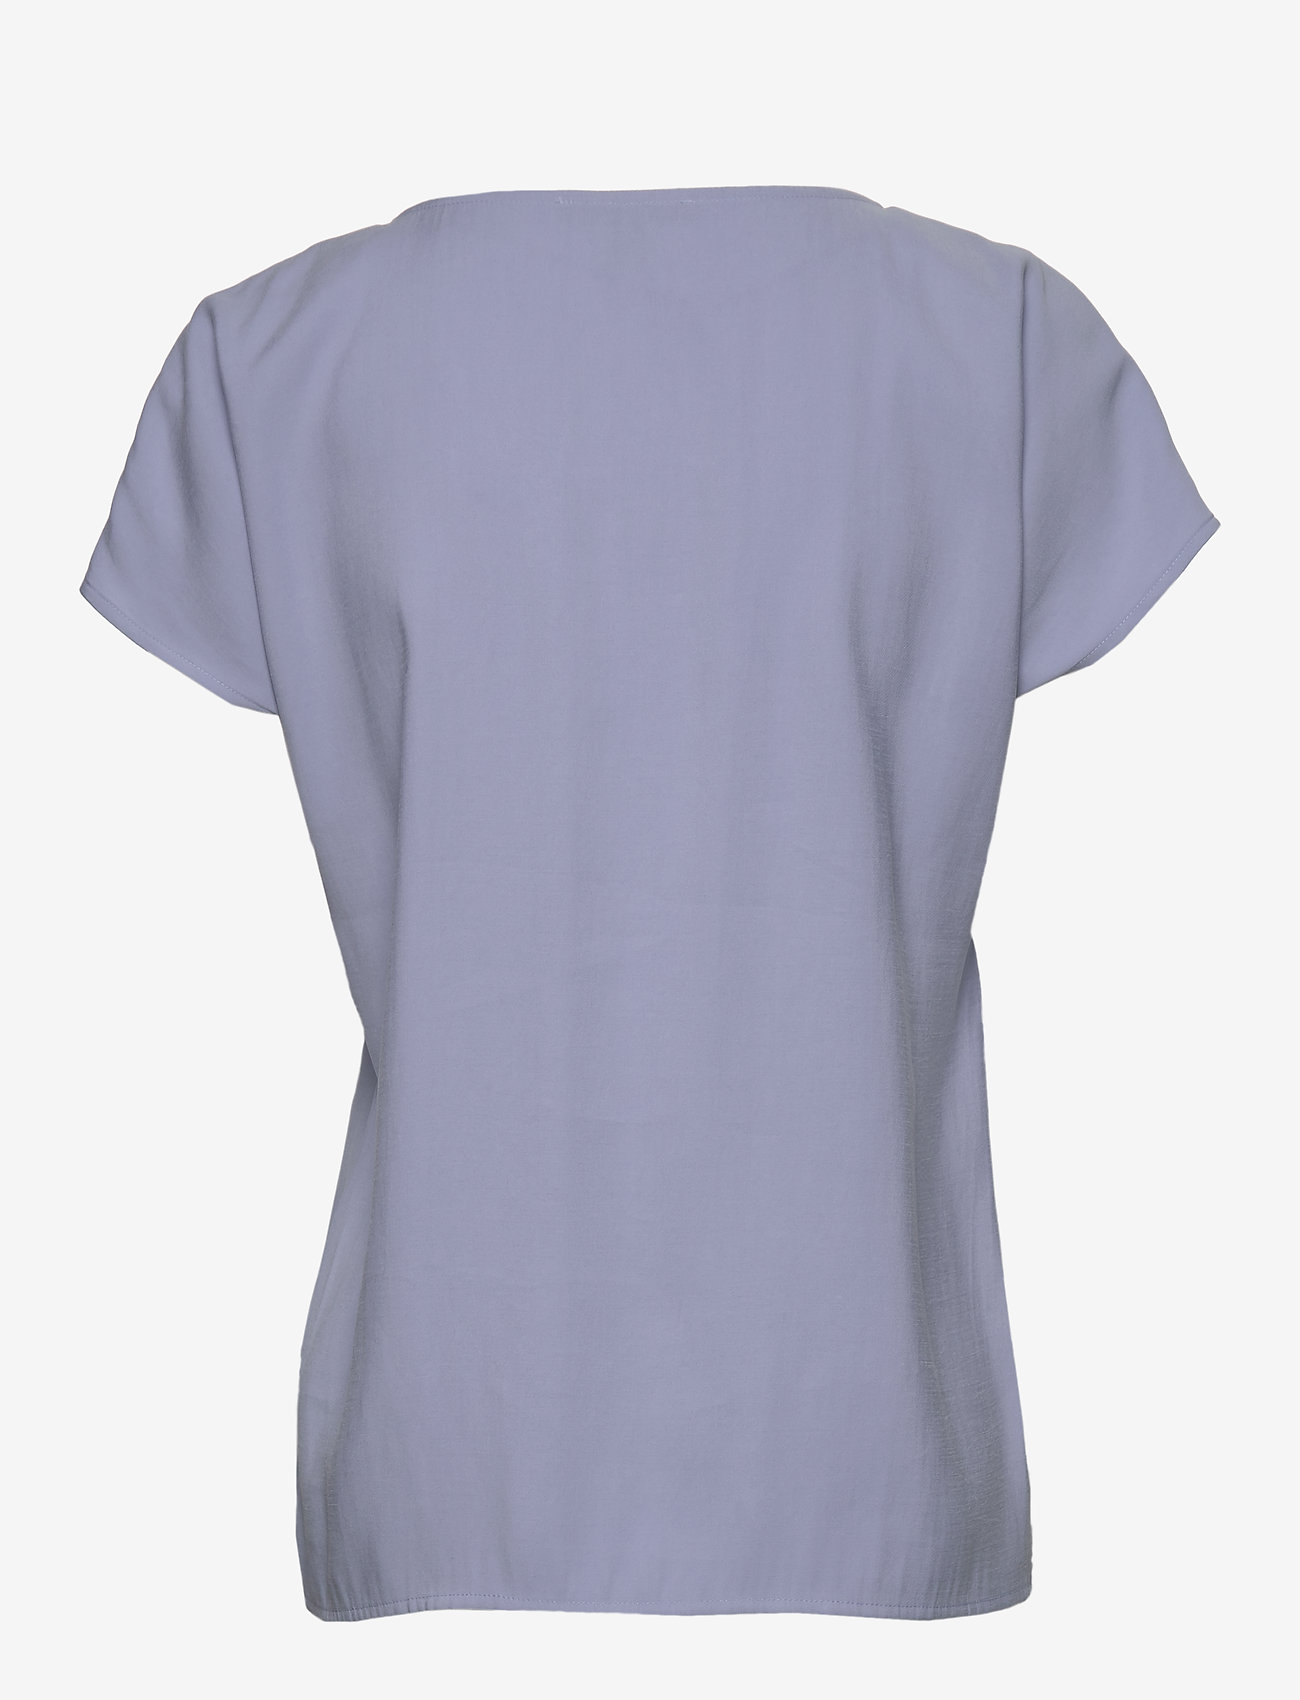 Esprit Collection - Blouses woven - kortermede bluser - blue lavender - 1